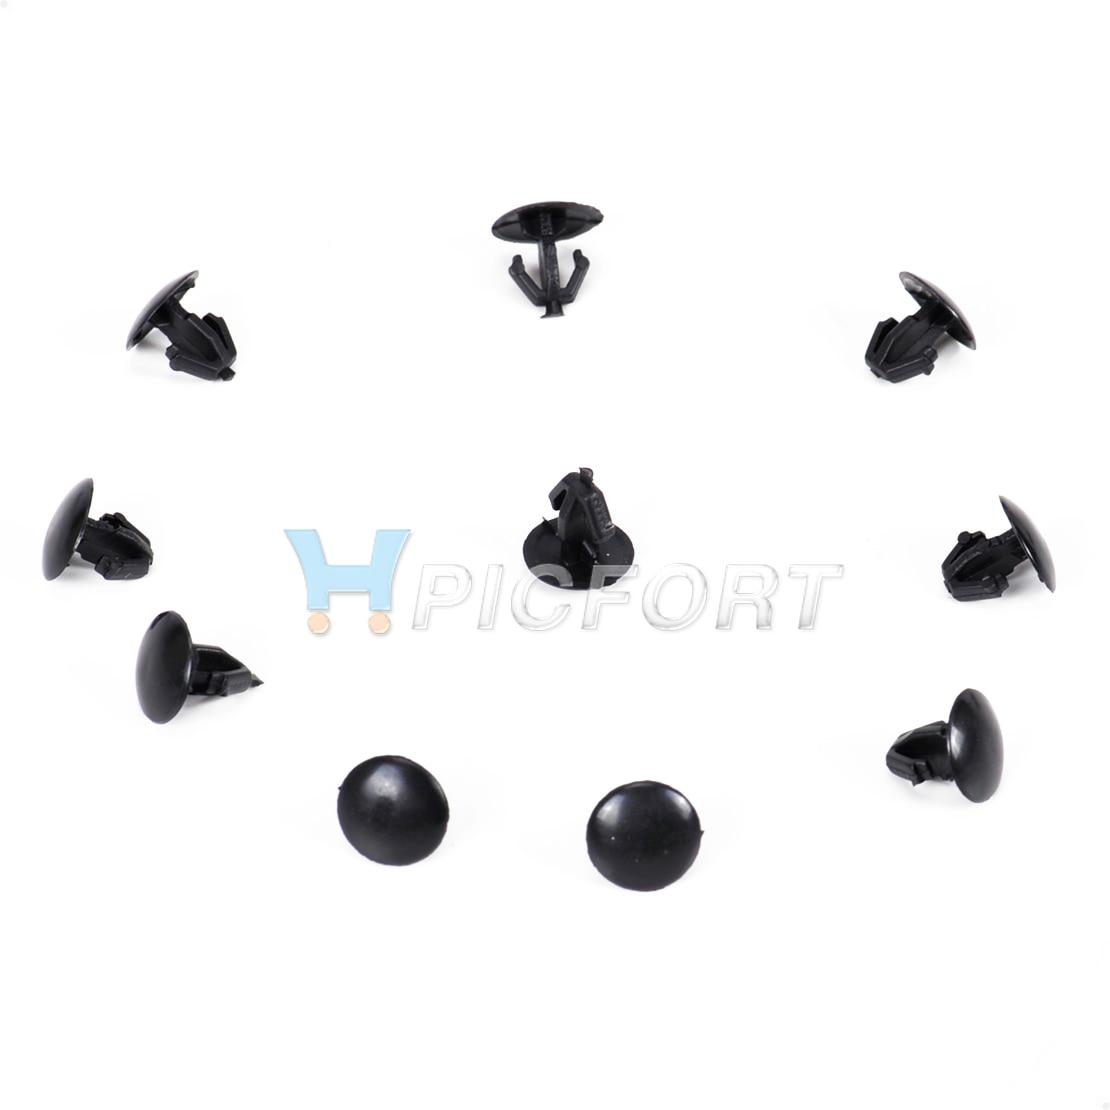 DWCX 10x Black Nylon Retainer Hood Seal Retaining Clip 91518-S10-003 for Honda Acoord Odyssey Acura RL RDX MDX Fit into 6mm Hole